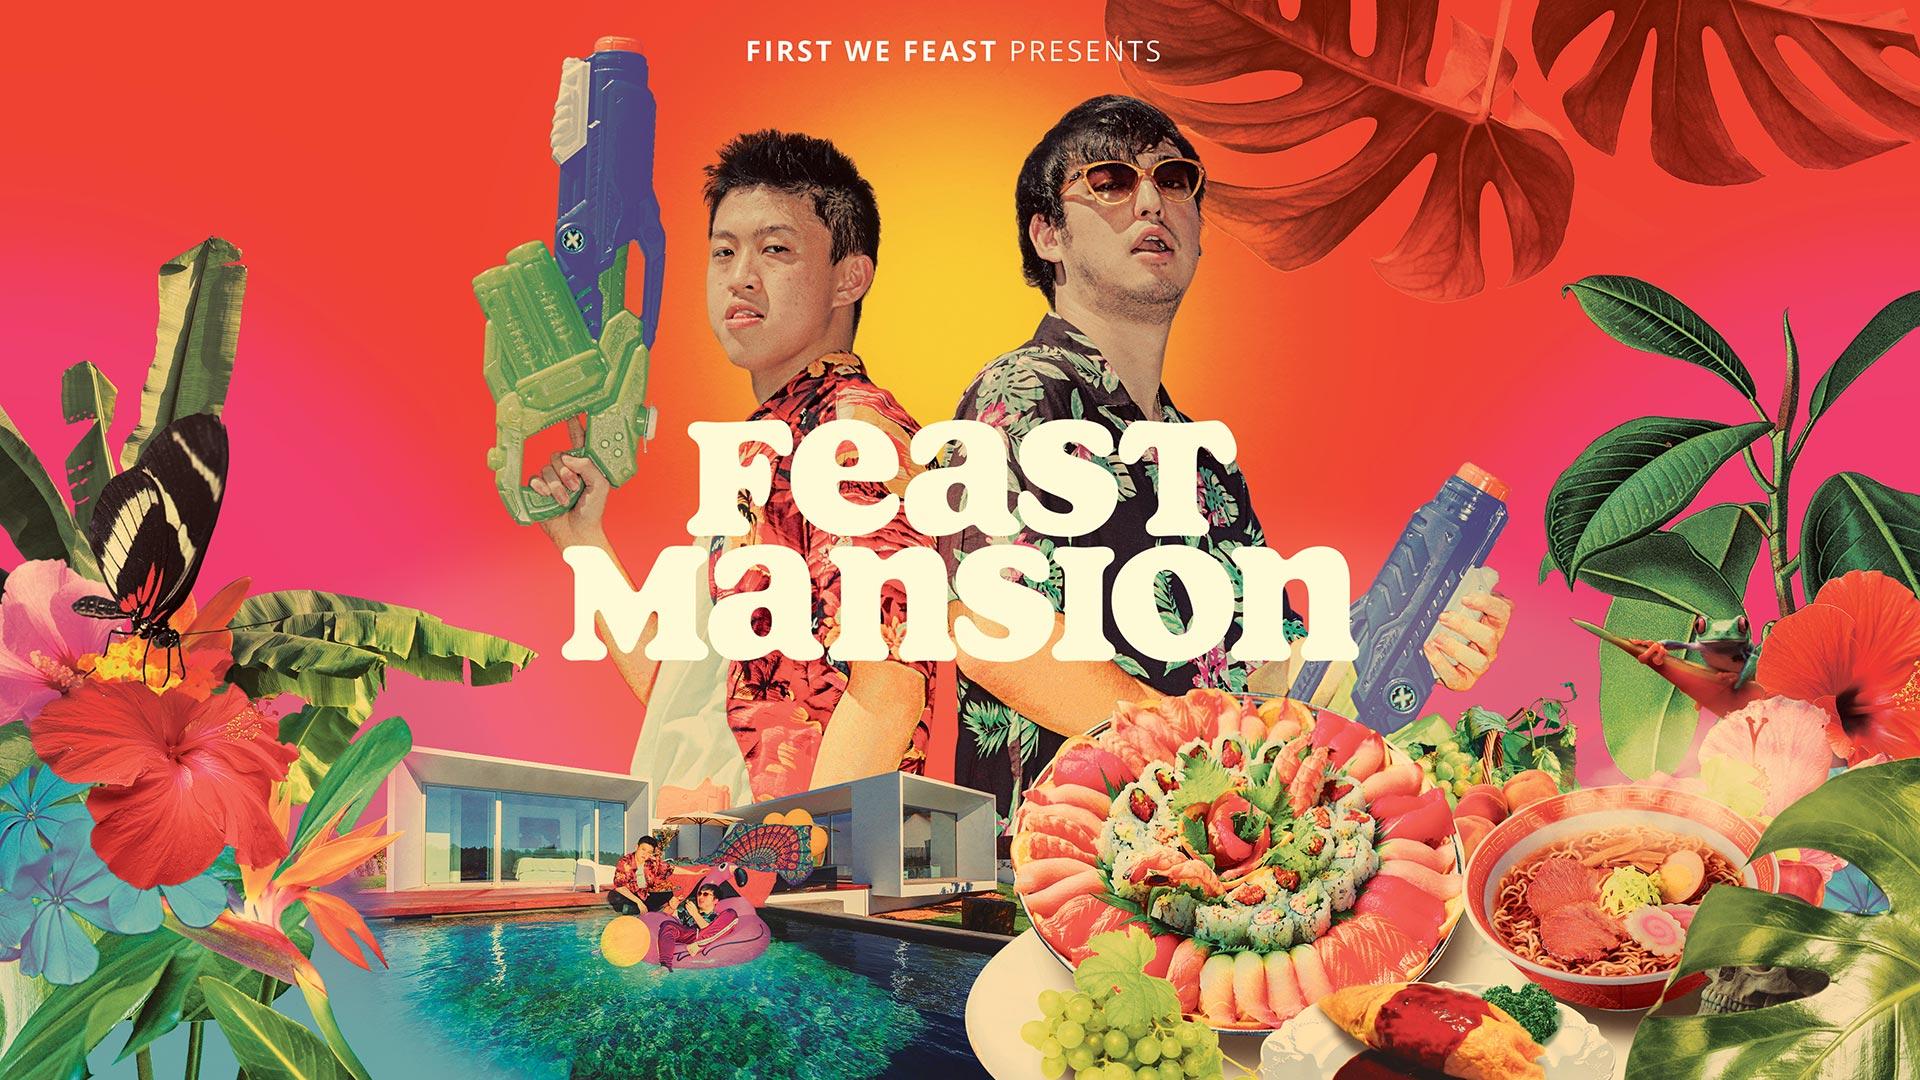 Joji & Rich Brian on The Feast Mansion Show